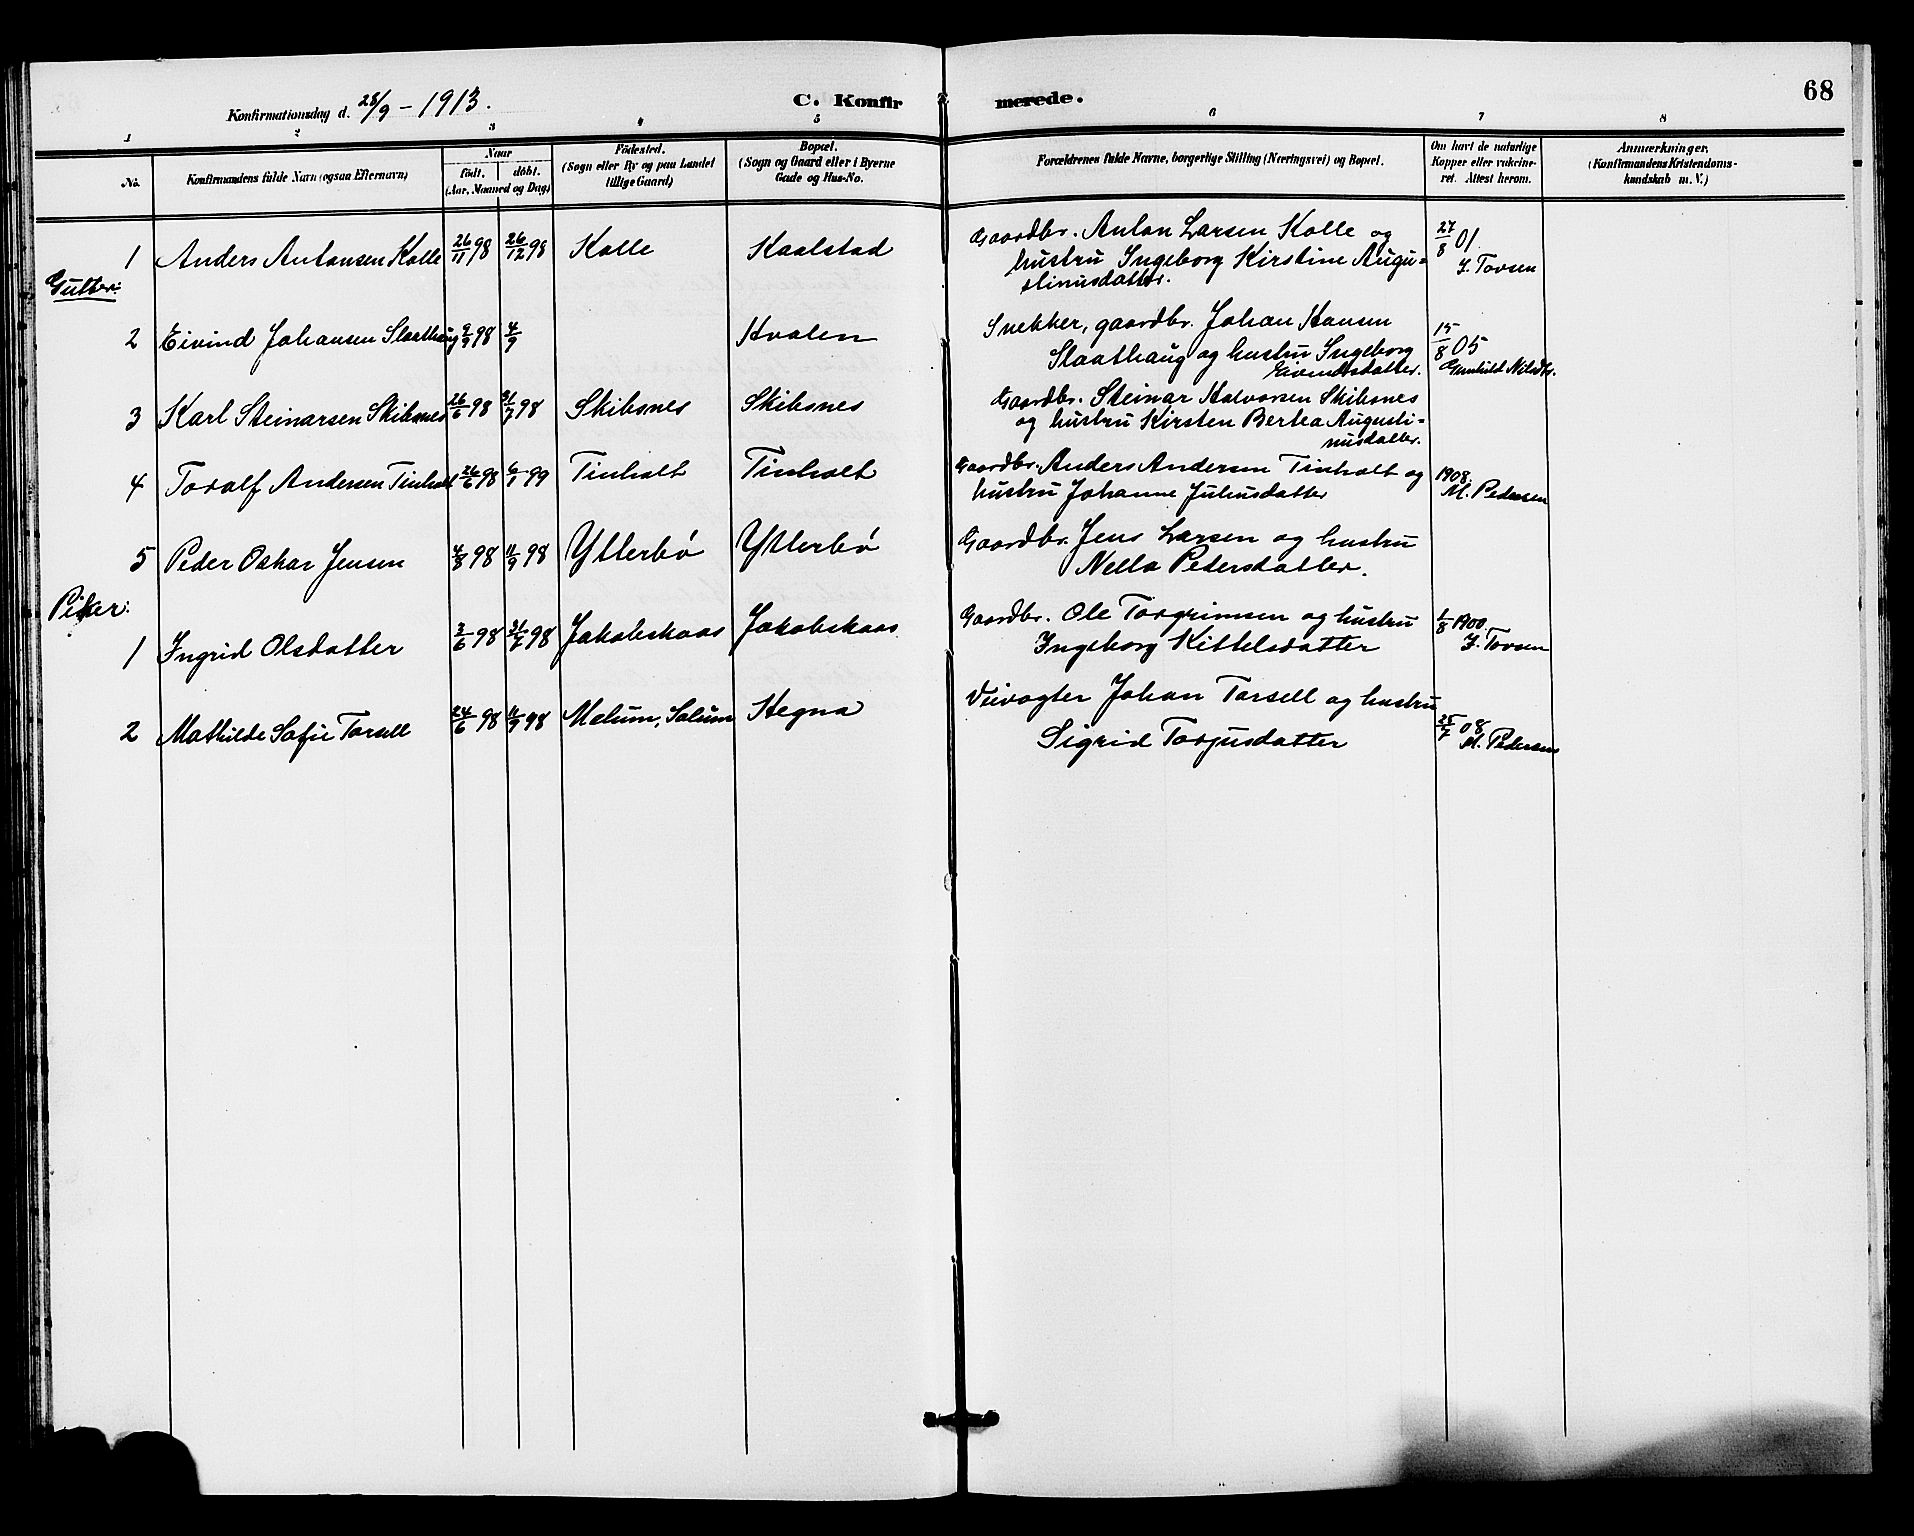 SAKO, Holla kirkebøker, G/Gb/L0002: Klokkerbok nr. II 2, 1897-1913, s. 68